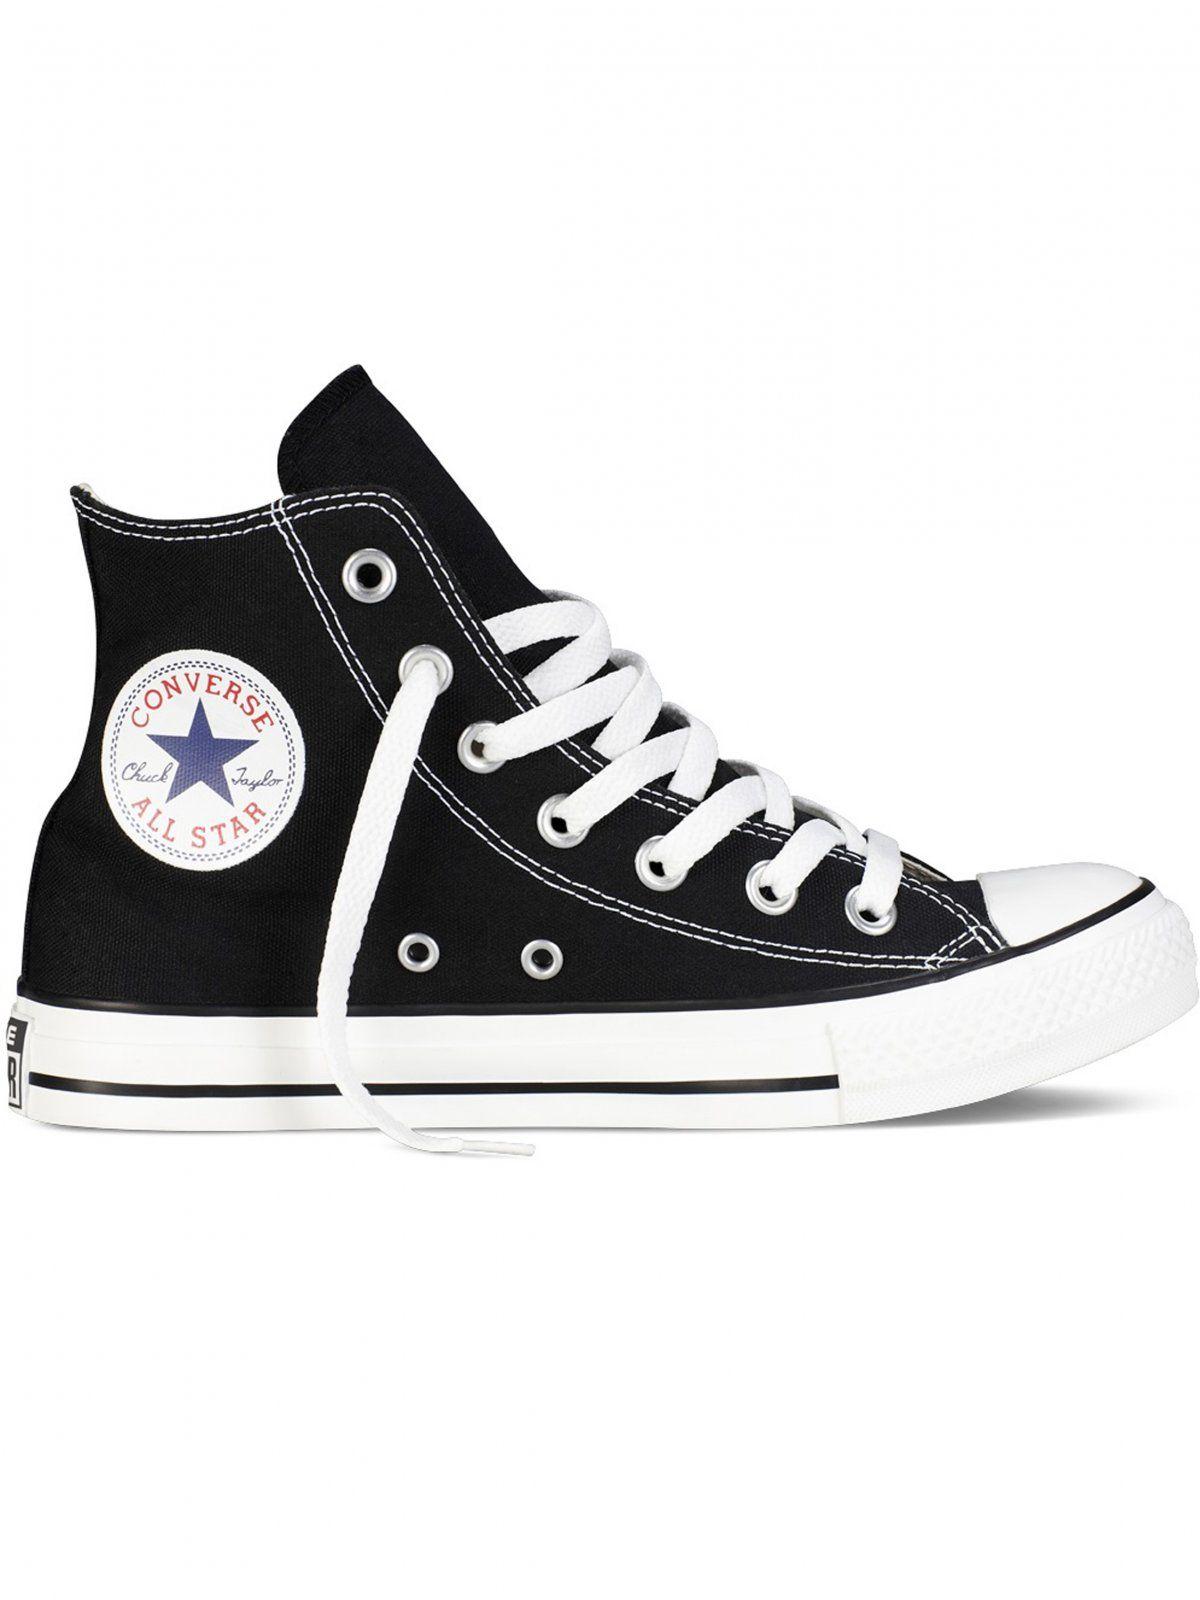 Converse All Star Unisex Chuck Taylor High Tops - Black/White